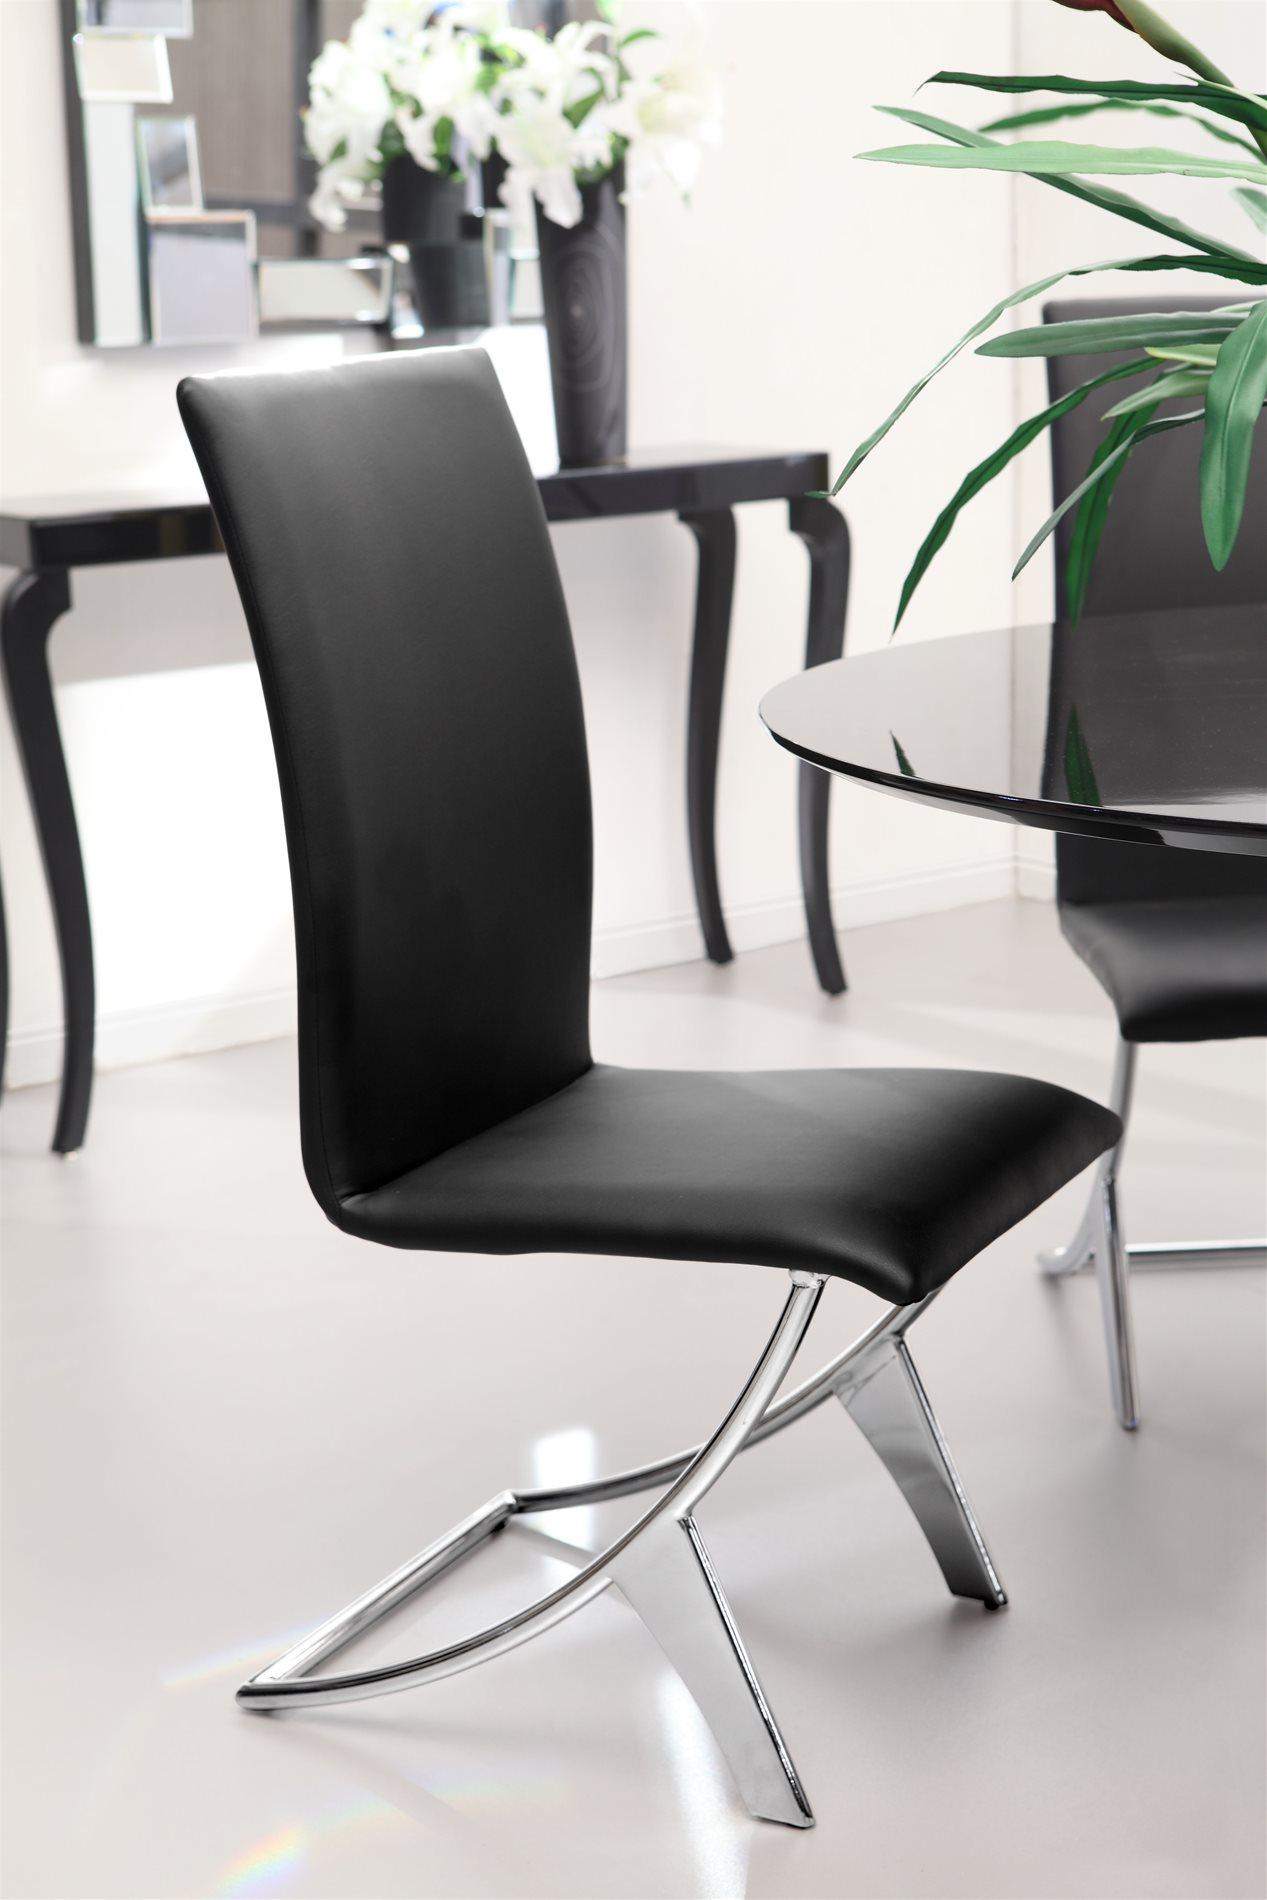 Zuo Modern 102101 Delfin Modern Dining Chair Pack Of 2